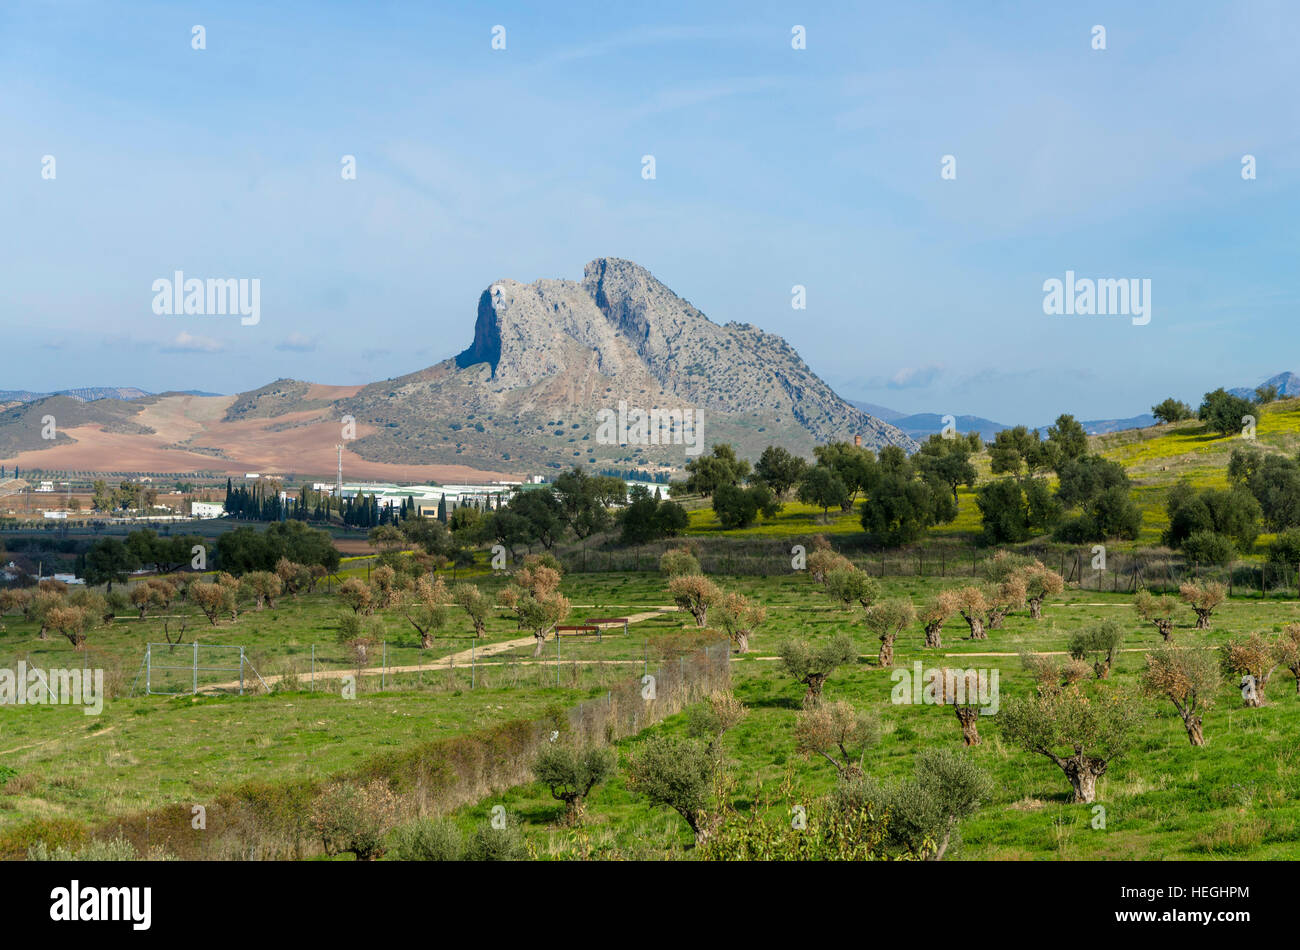 Peña de los Enamorados, mountain outside the town of Antequera, Andalusia, Spain. - Stock Image